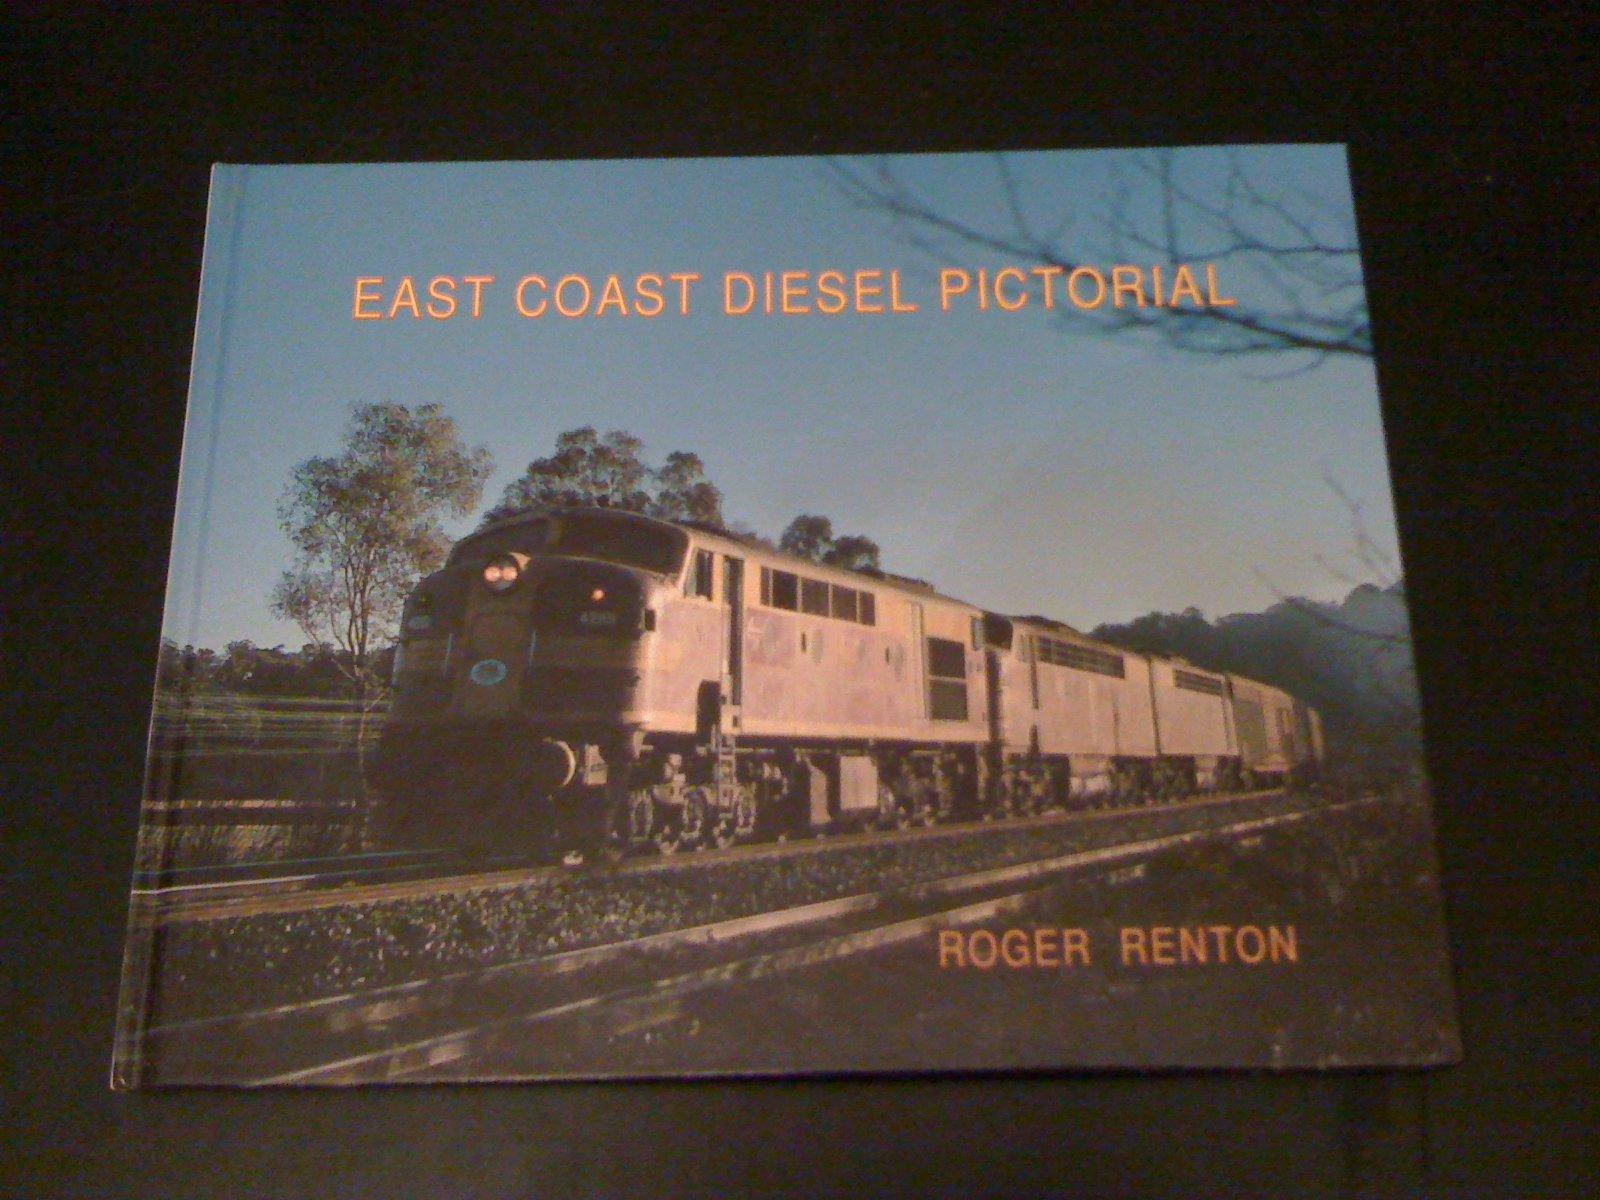 East Coast Diesel >> East Coast Diesel Pictorial Roger Renton Amazon Com Books